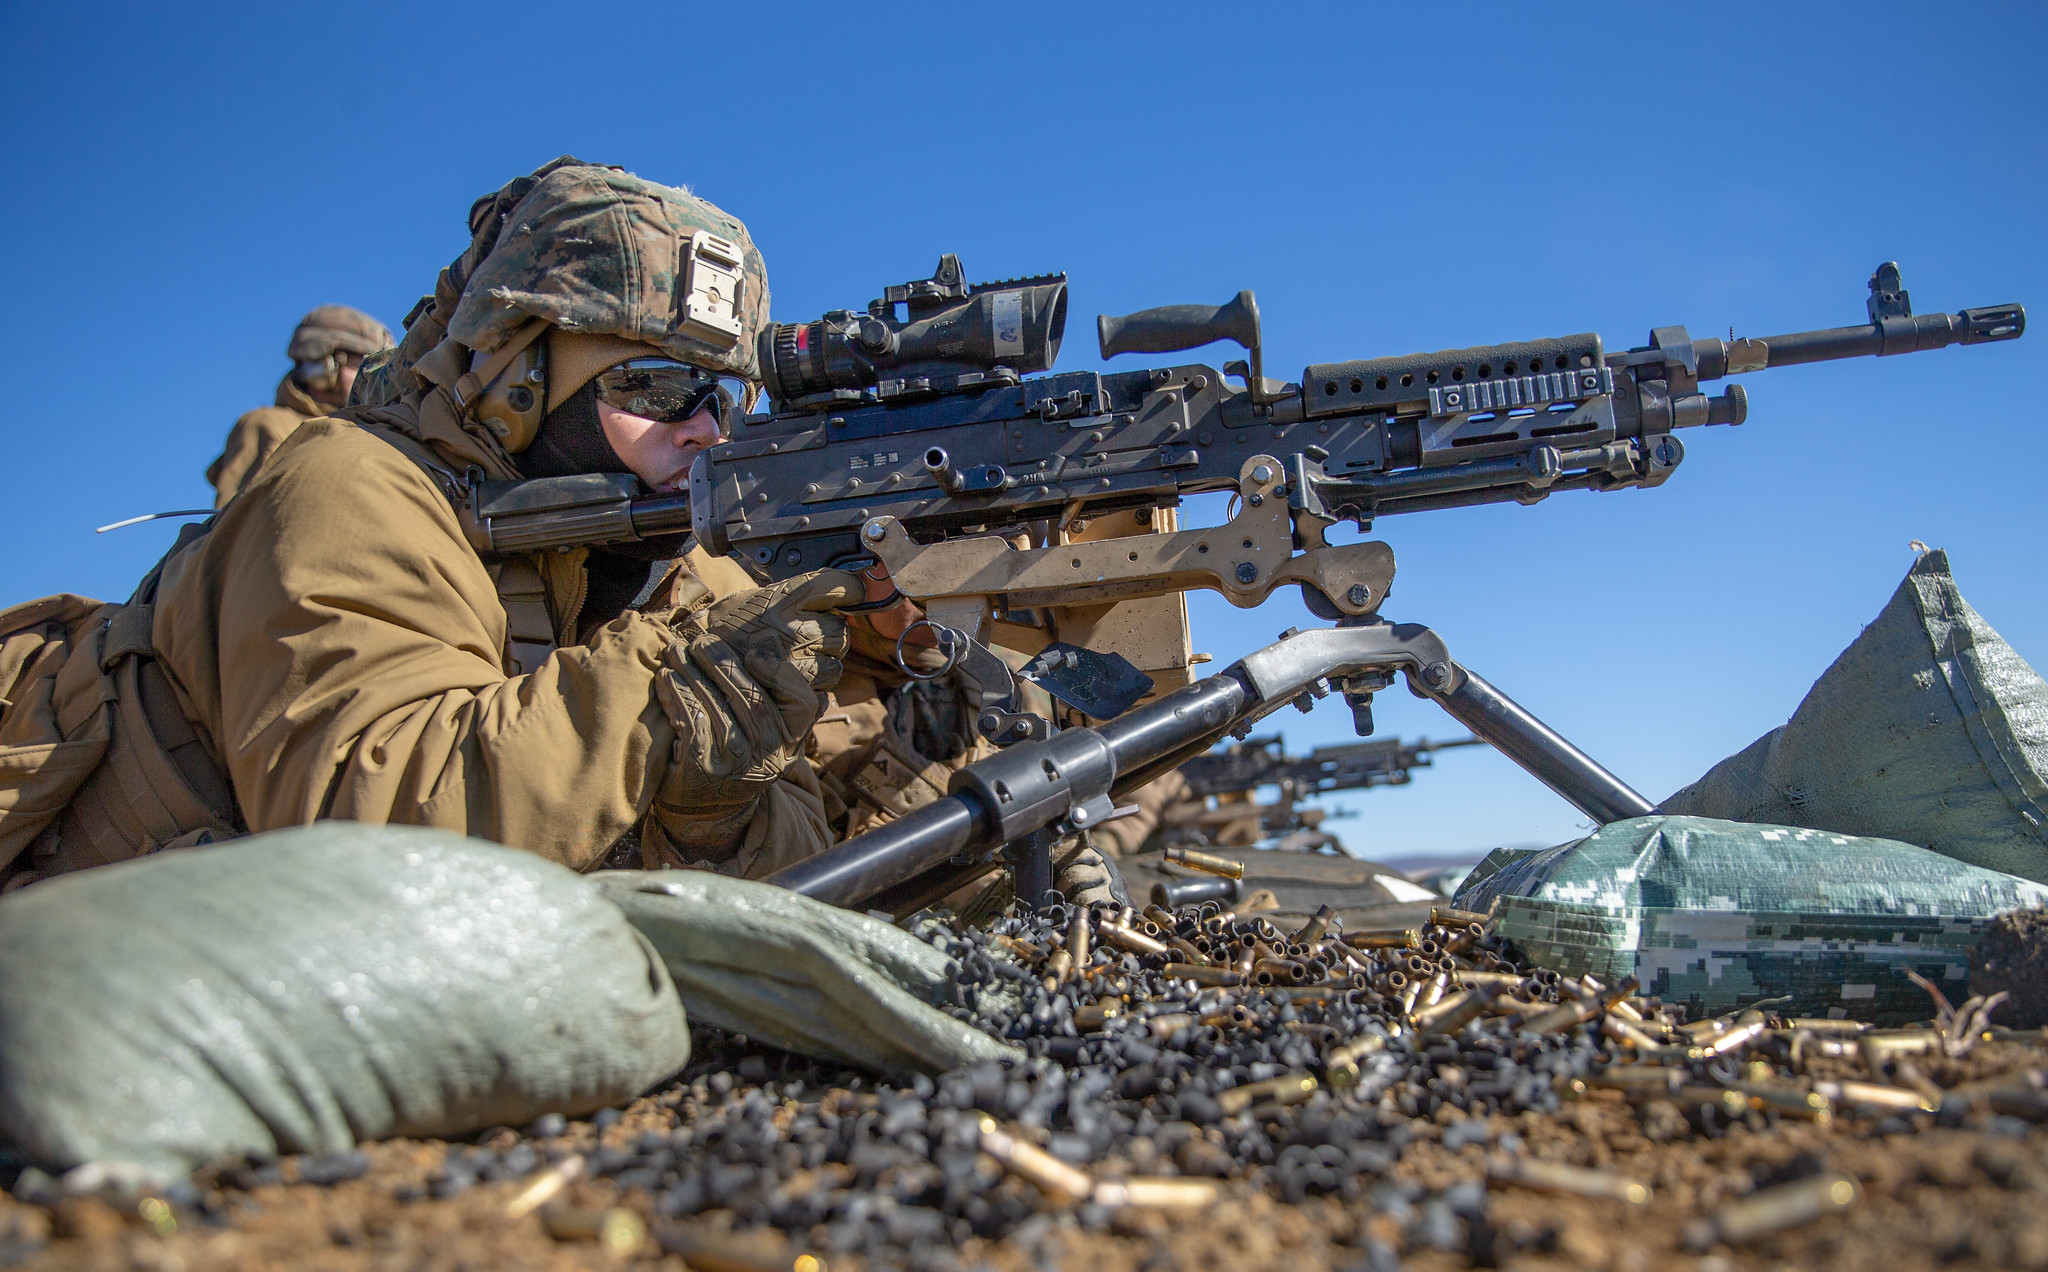 Hospital Corpsman 3rd Class Neil Rioja participates in live-fire M240B machine gun range training Feb. 9, 2021, during Artillery Relocation Training Program 20.4 at Combined Arms Training Center, Camp Fuji, Japan. (Lance Cpl. Scott Aubuchon/Marine Corps)